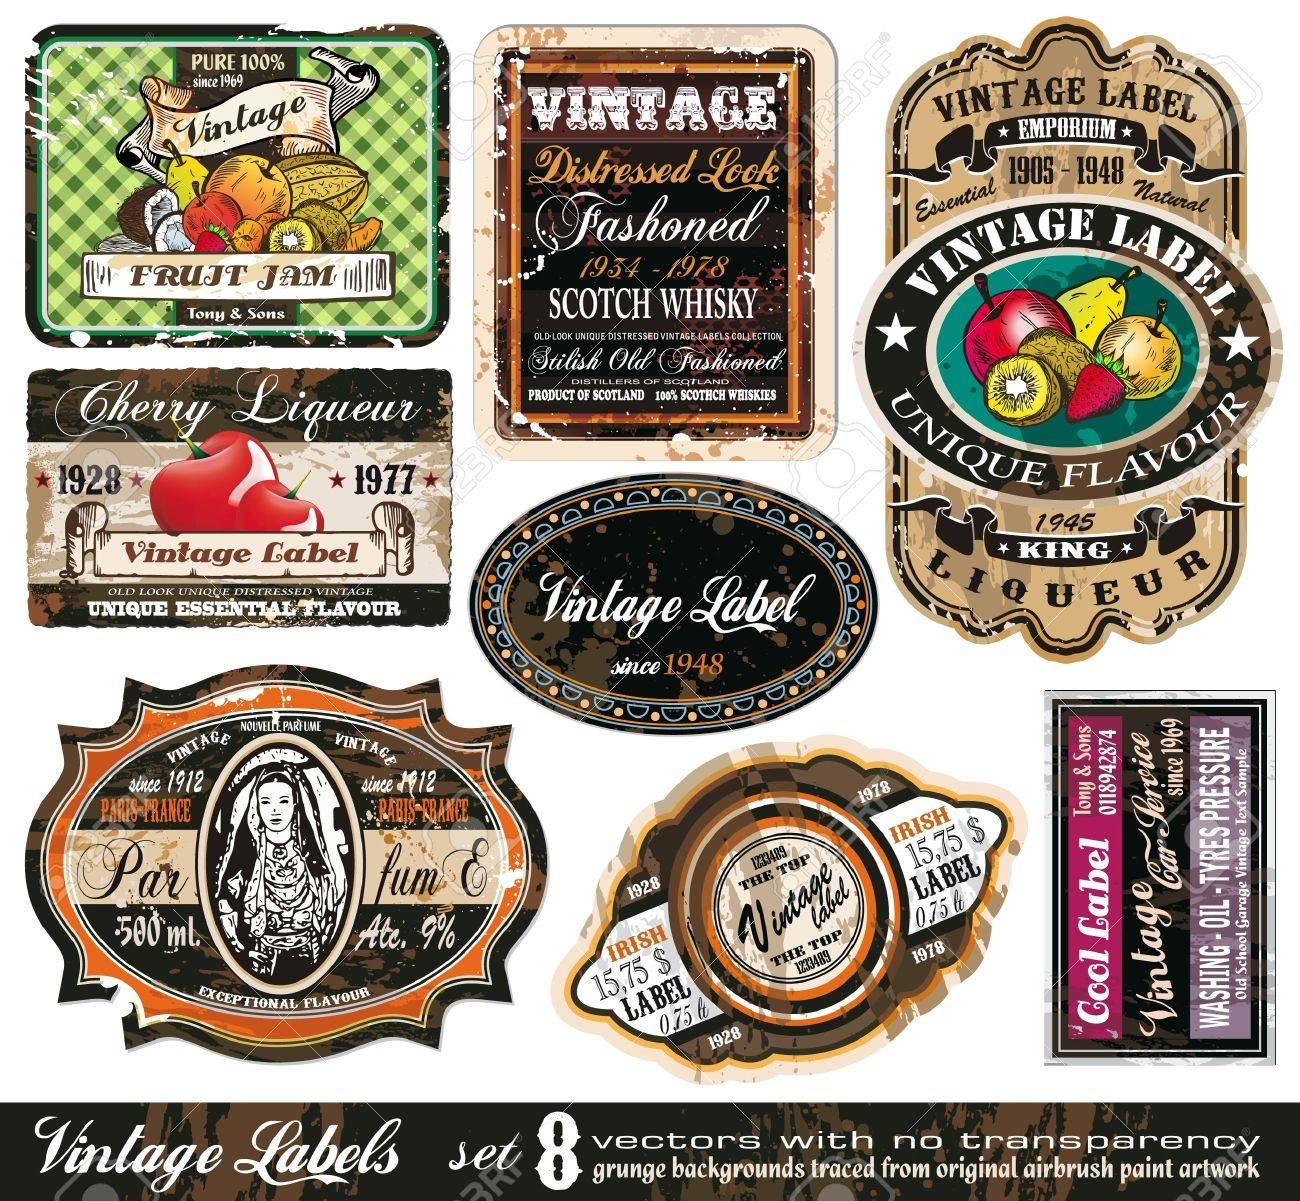 Vintage Labels Collection - 8 design elements with original antique style -Set 8 - 9226780